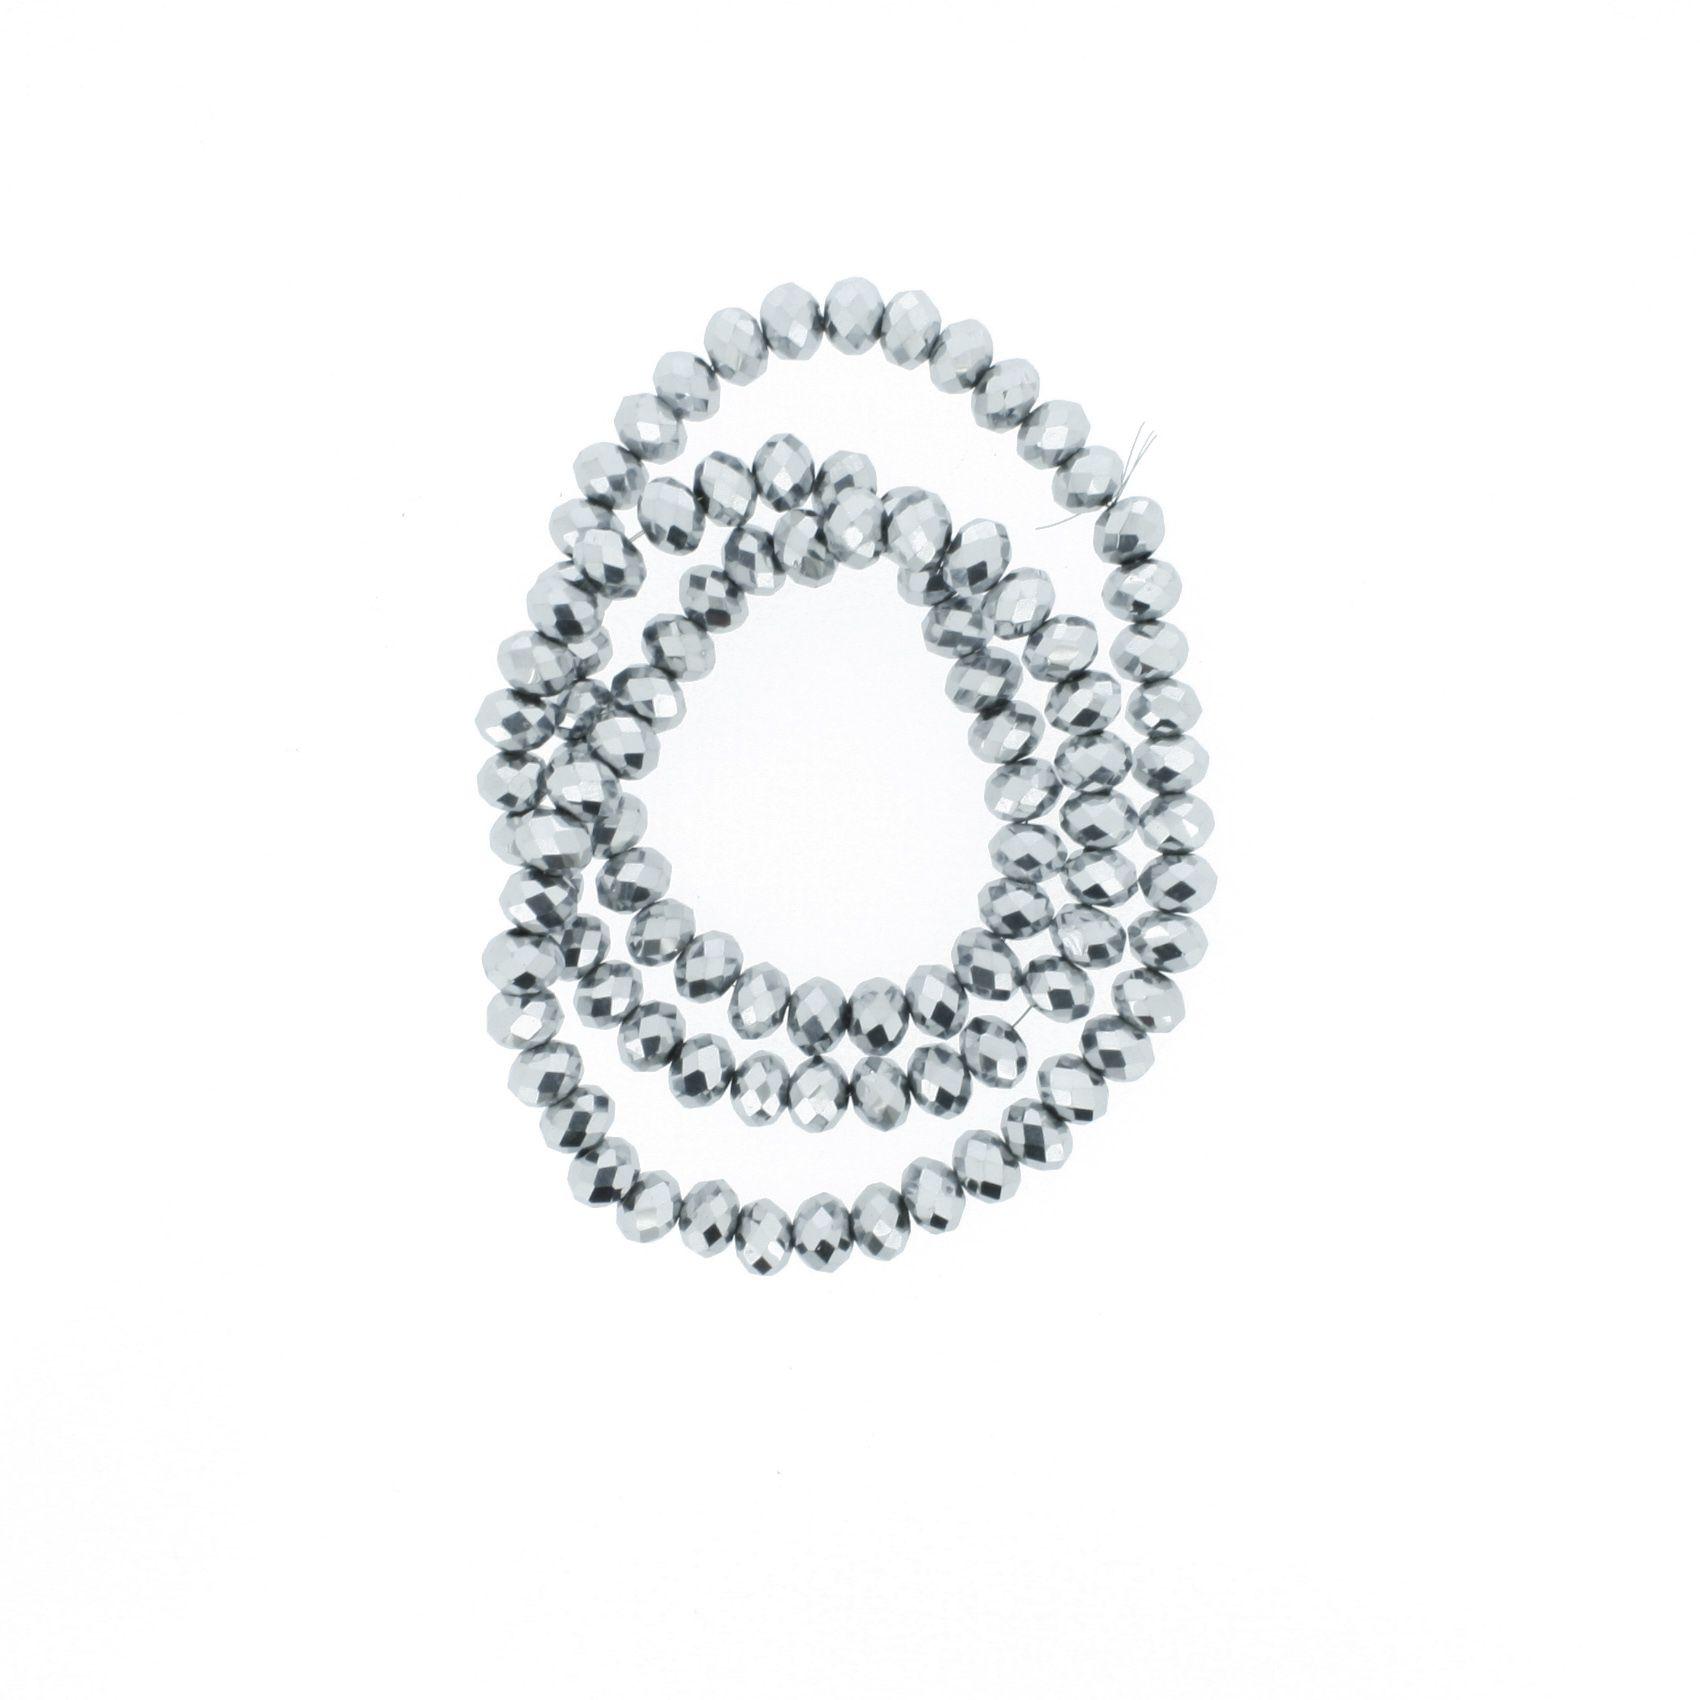 Fio de Cristal - Flat® - Prateado - 6mm  - Stéphanie Bijoux® - Peças para Bijuterias e Artesanato